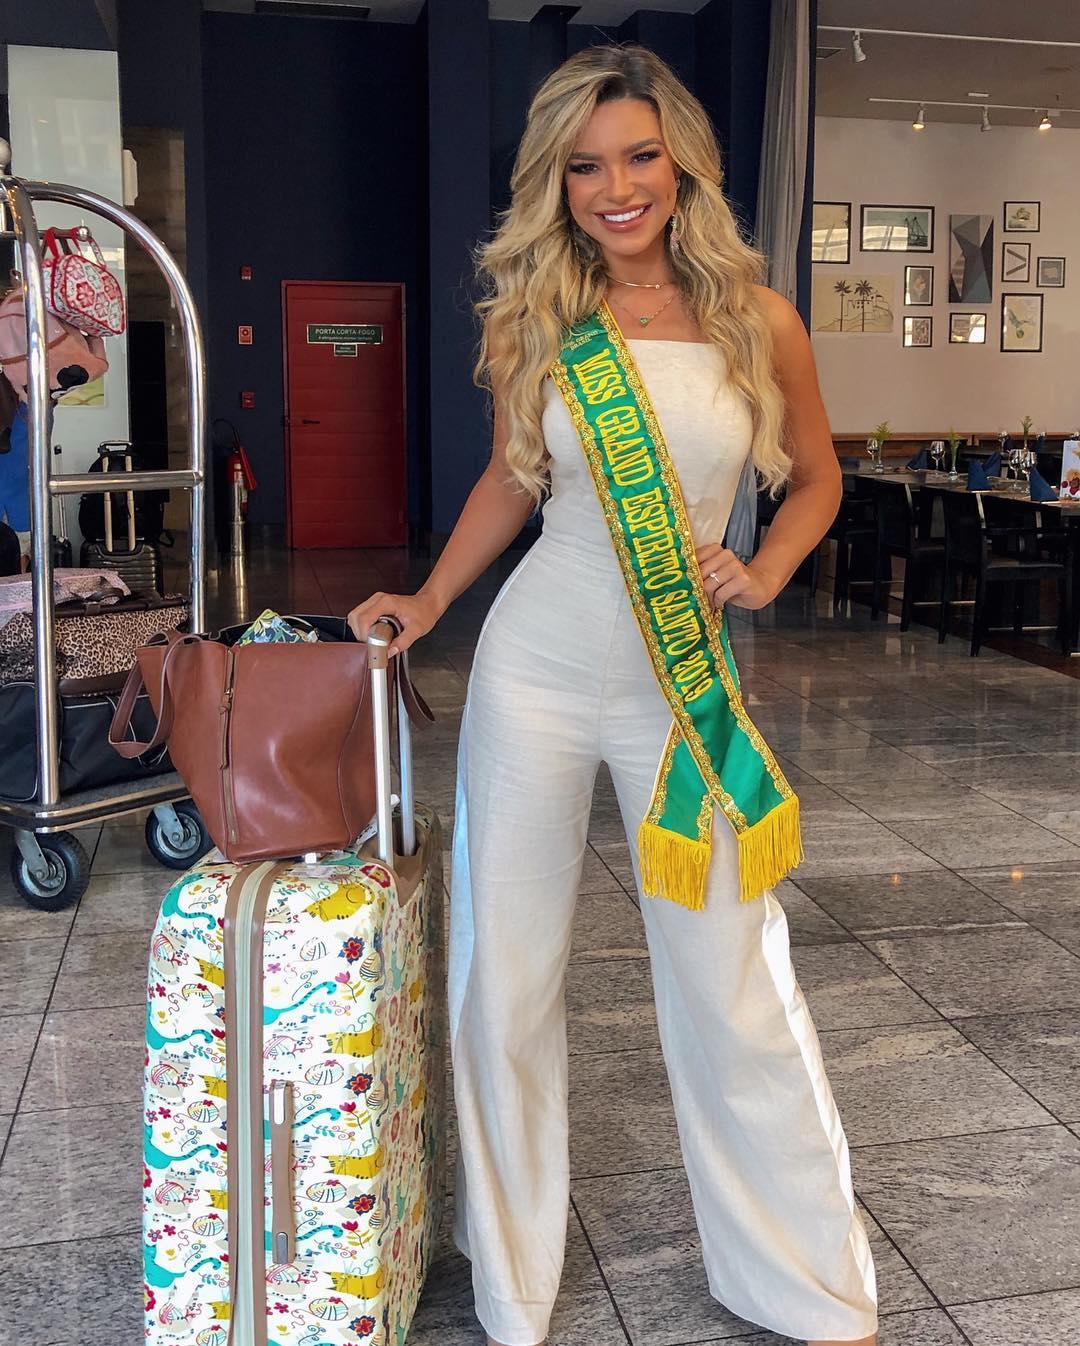 amanda cardoso, miss grand espirito santo 2019/3rd runner-up de miss intercontinental 2017. - Página 13 51960910